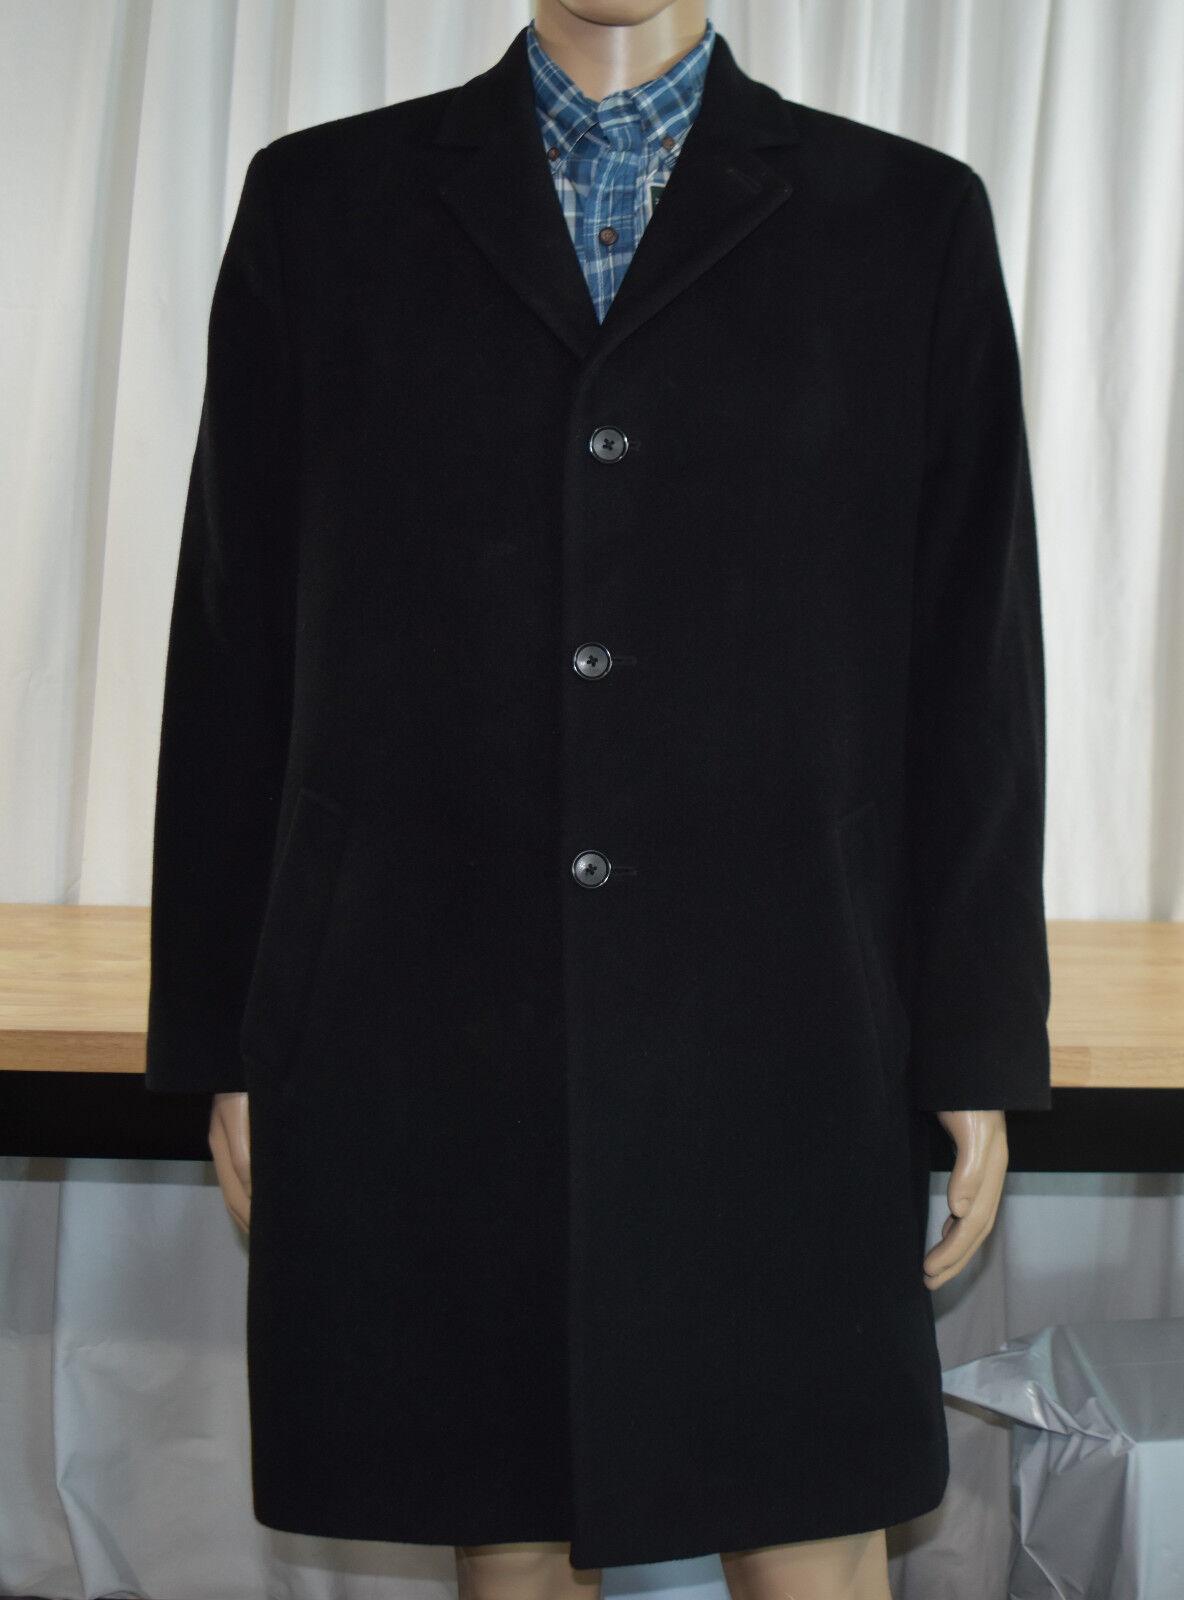 Hathaway Platinum Wool & Cashmere Blend Italian Woven Dress Coat, 42 Short, Blk